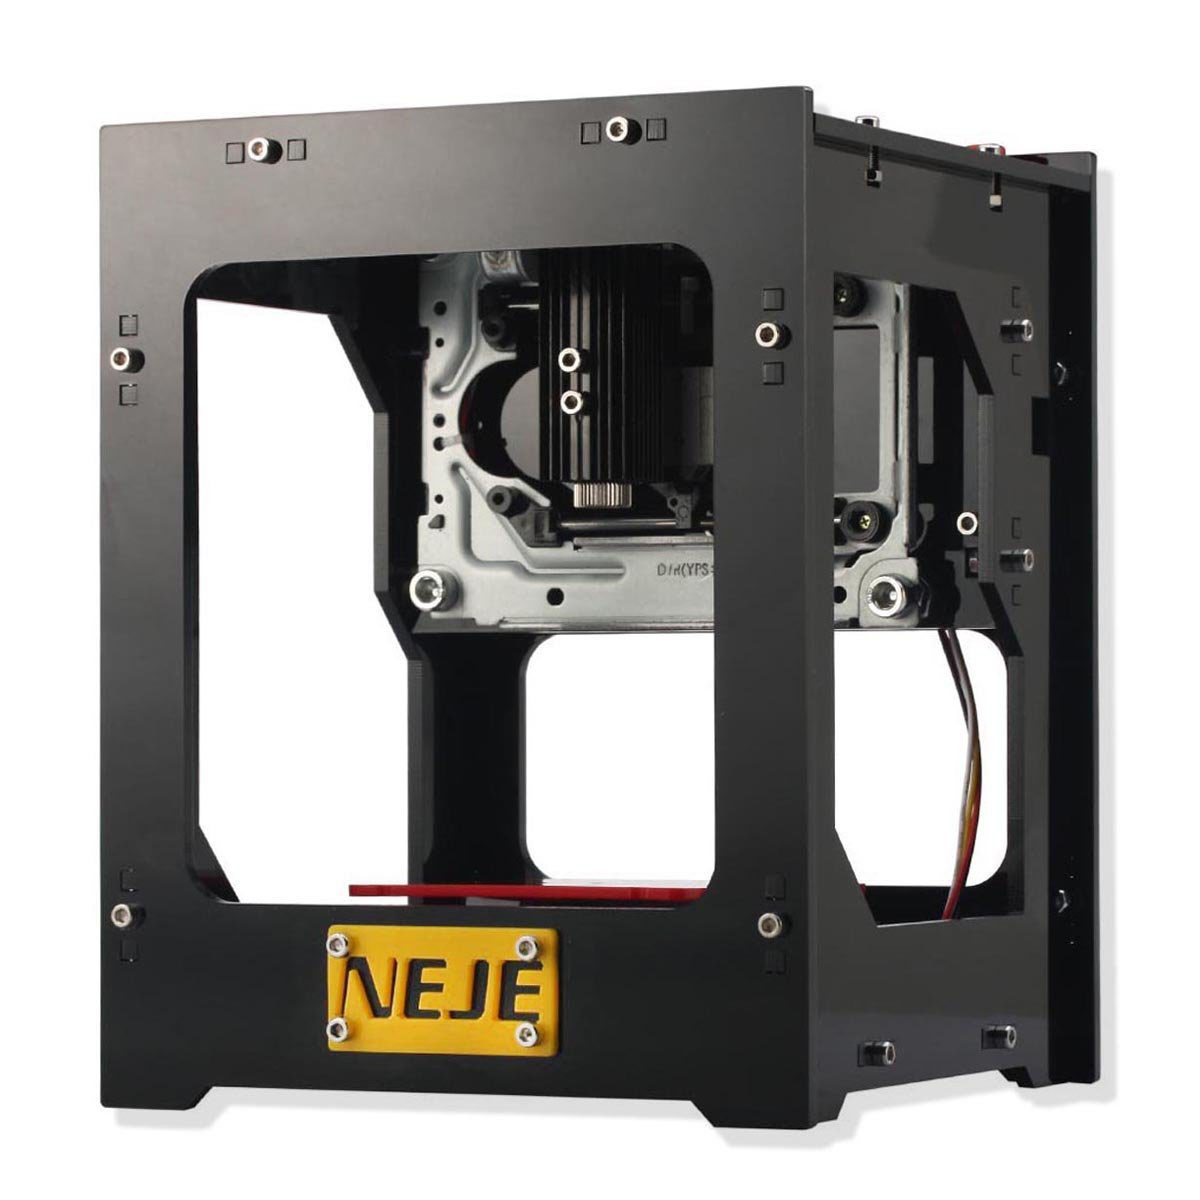 THGS NEJE DK-BL 405nm 1500 mw DIY Engraver Drucker Laser-Gravur Maschine Bluetooth USB